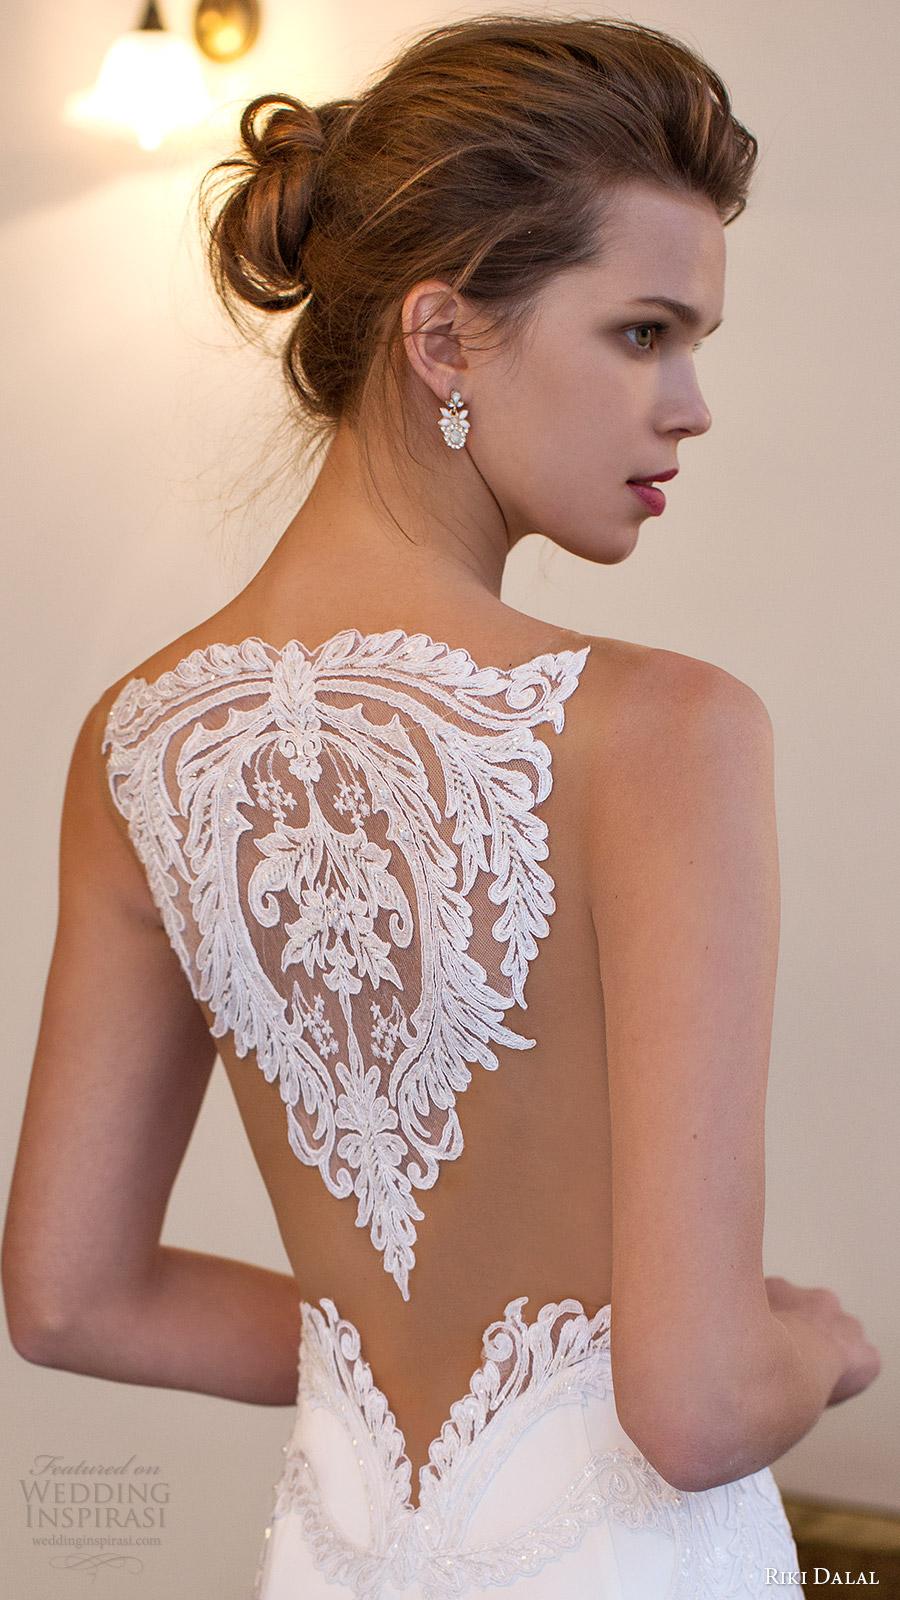 riki dalal bridal 2016 sleeveless modified deep v neck illusion jewel lace bodice sheath wedding dress (1806) zv elegant train sheer back